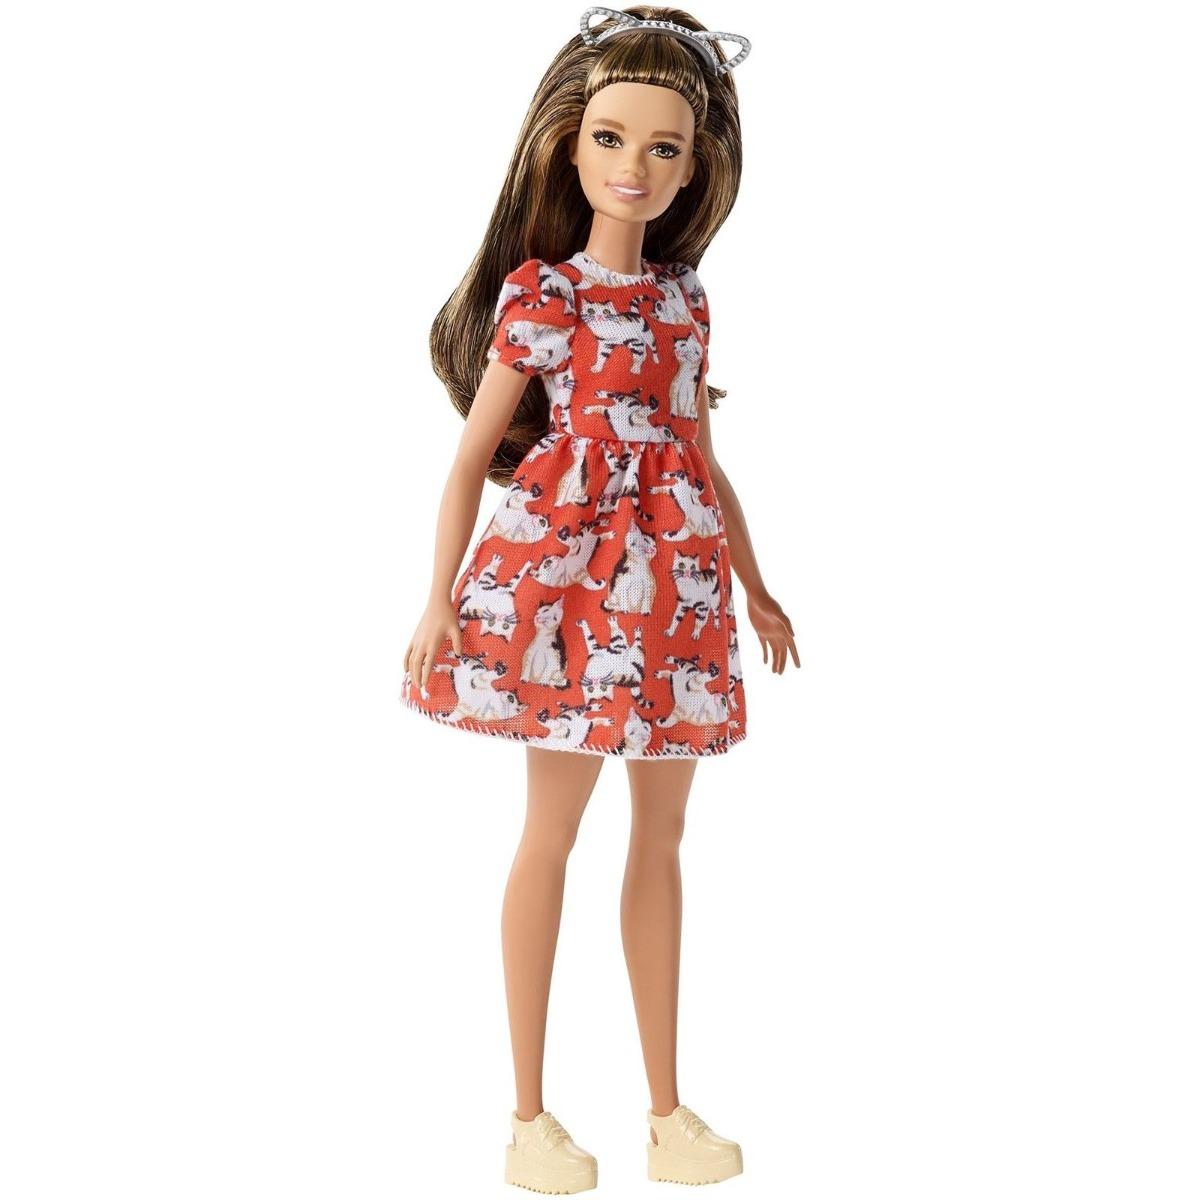 Papusa Barbie Fashionistas - Style, FJF58